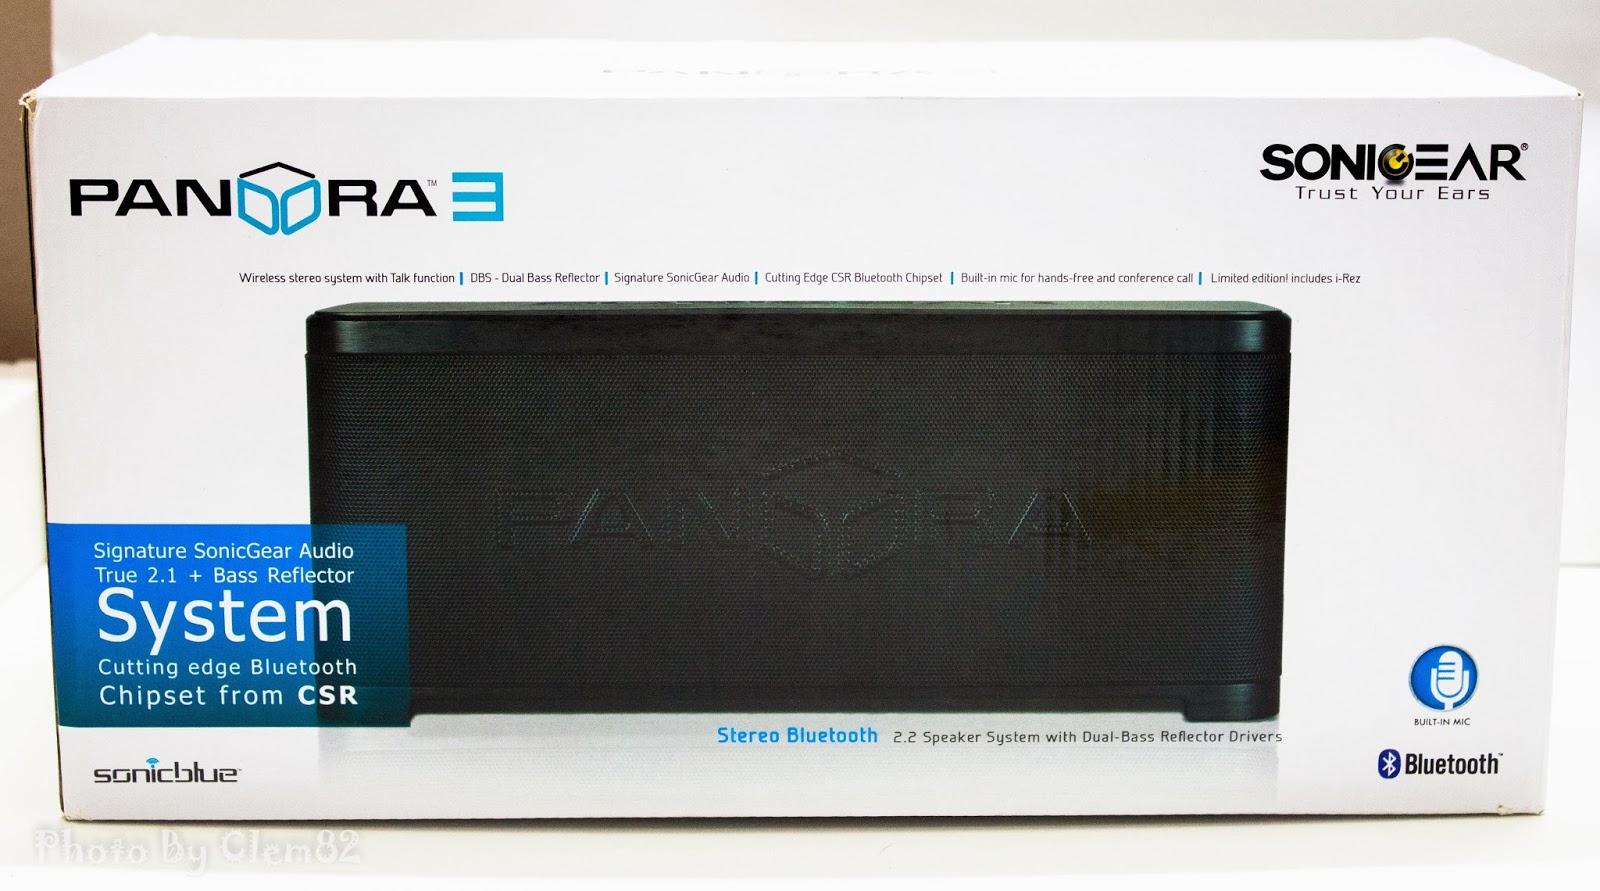 Opening Pandora's Box: SonicGear Pandora Wireless Bluetooth Media Player Series 19